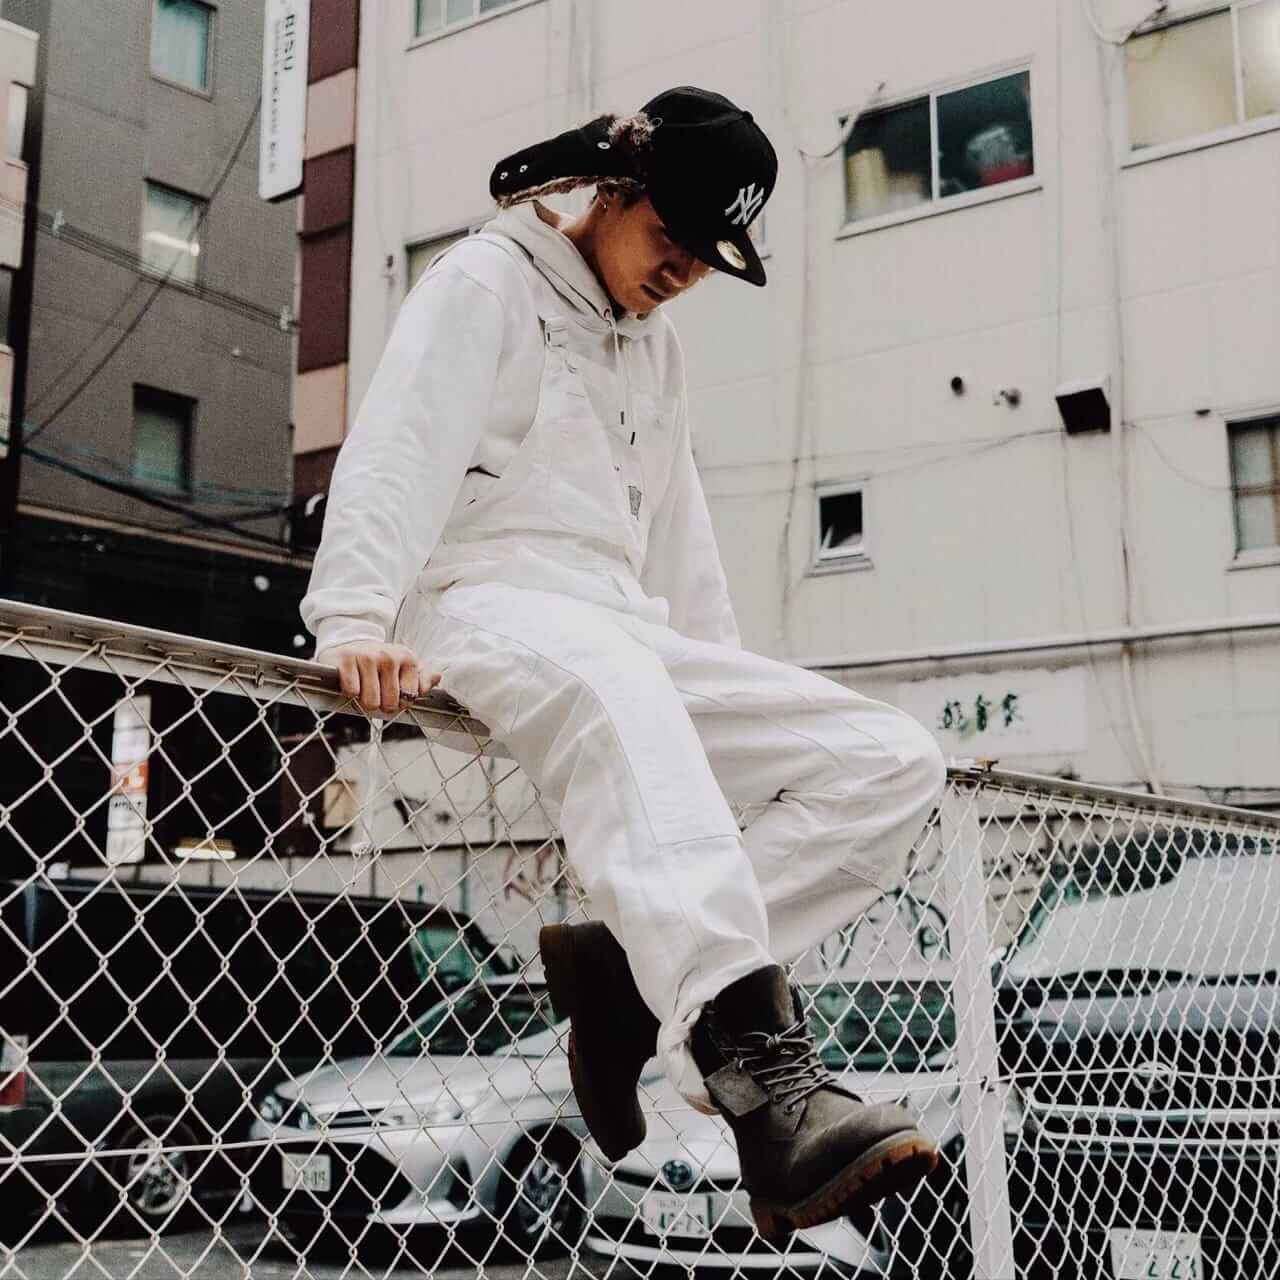 "iCE KiD インタビュー |「""ジャンル ✕ ジャンル"" でジャンルの壁をぶっ壊すイメージで制作している」【IYOW 】"